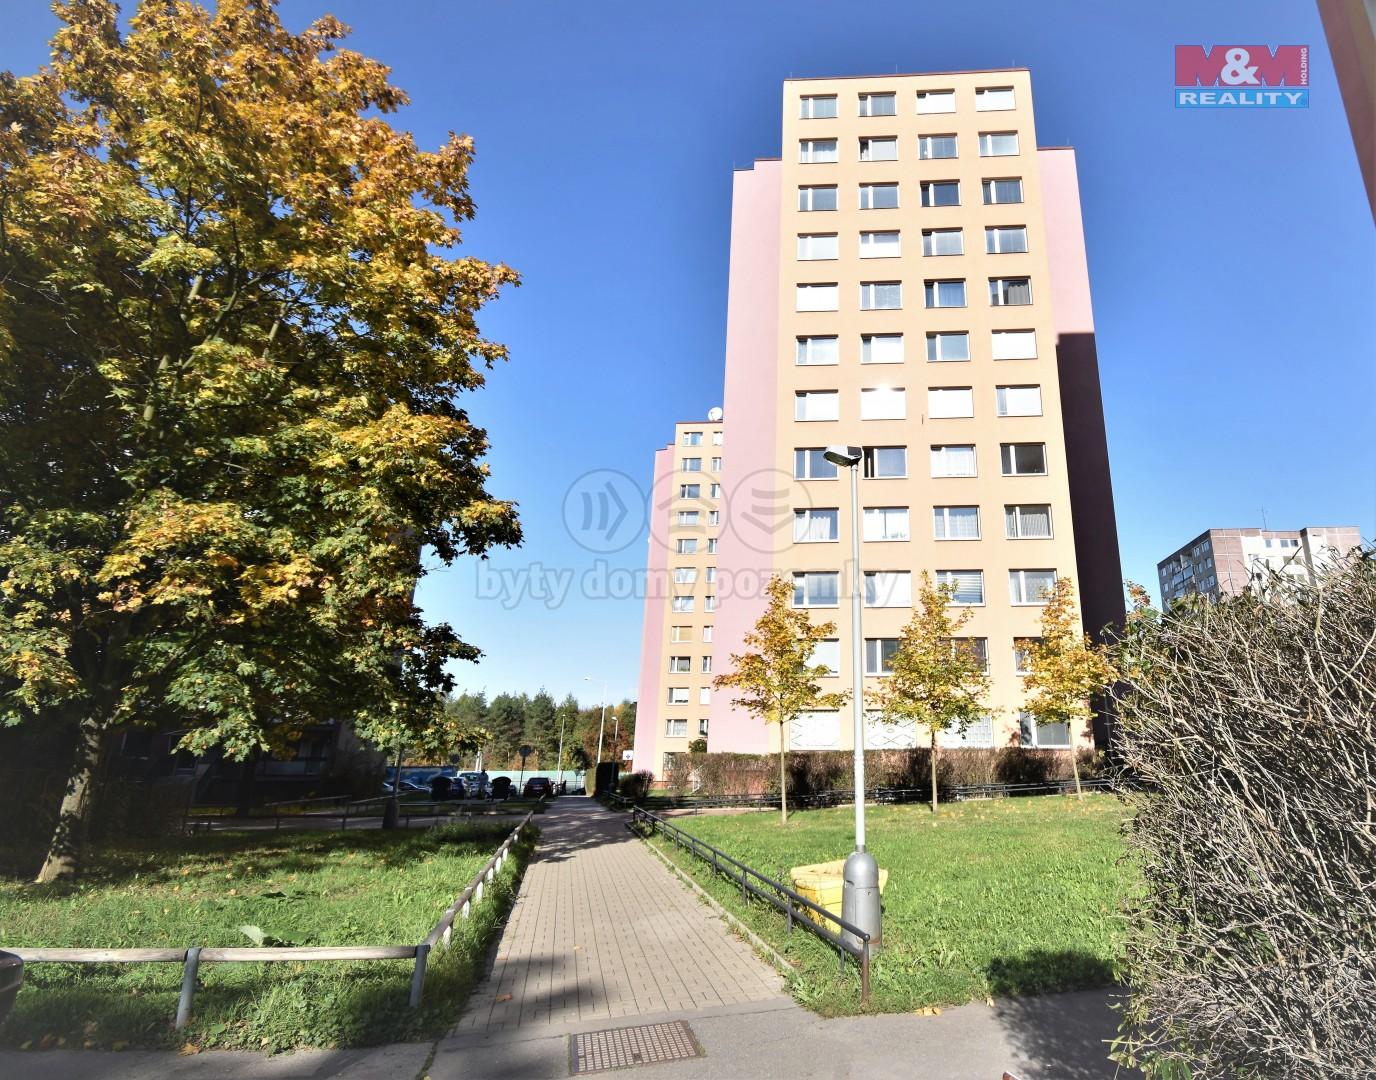 Prodej bytu 3+1, 86 m², Praha, ul. Werichova